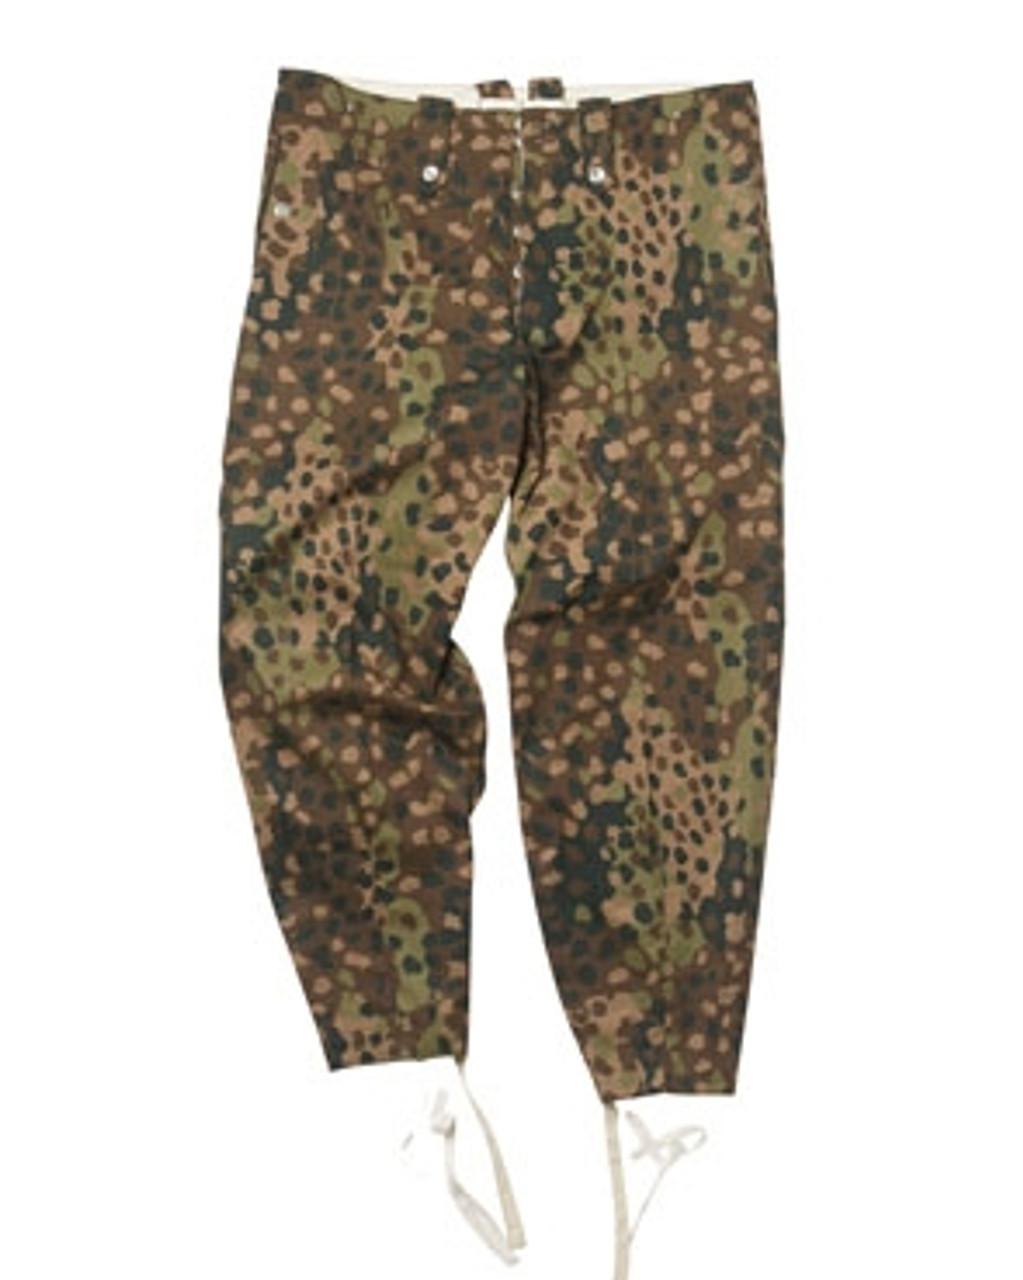 SS M44 Pea Dot Camo Field Trousers- STURM from Hessen Antique